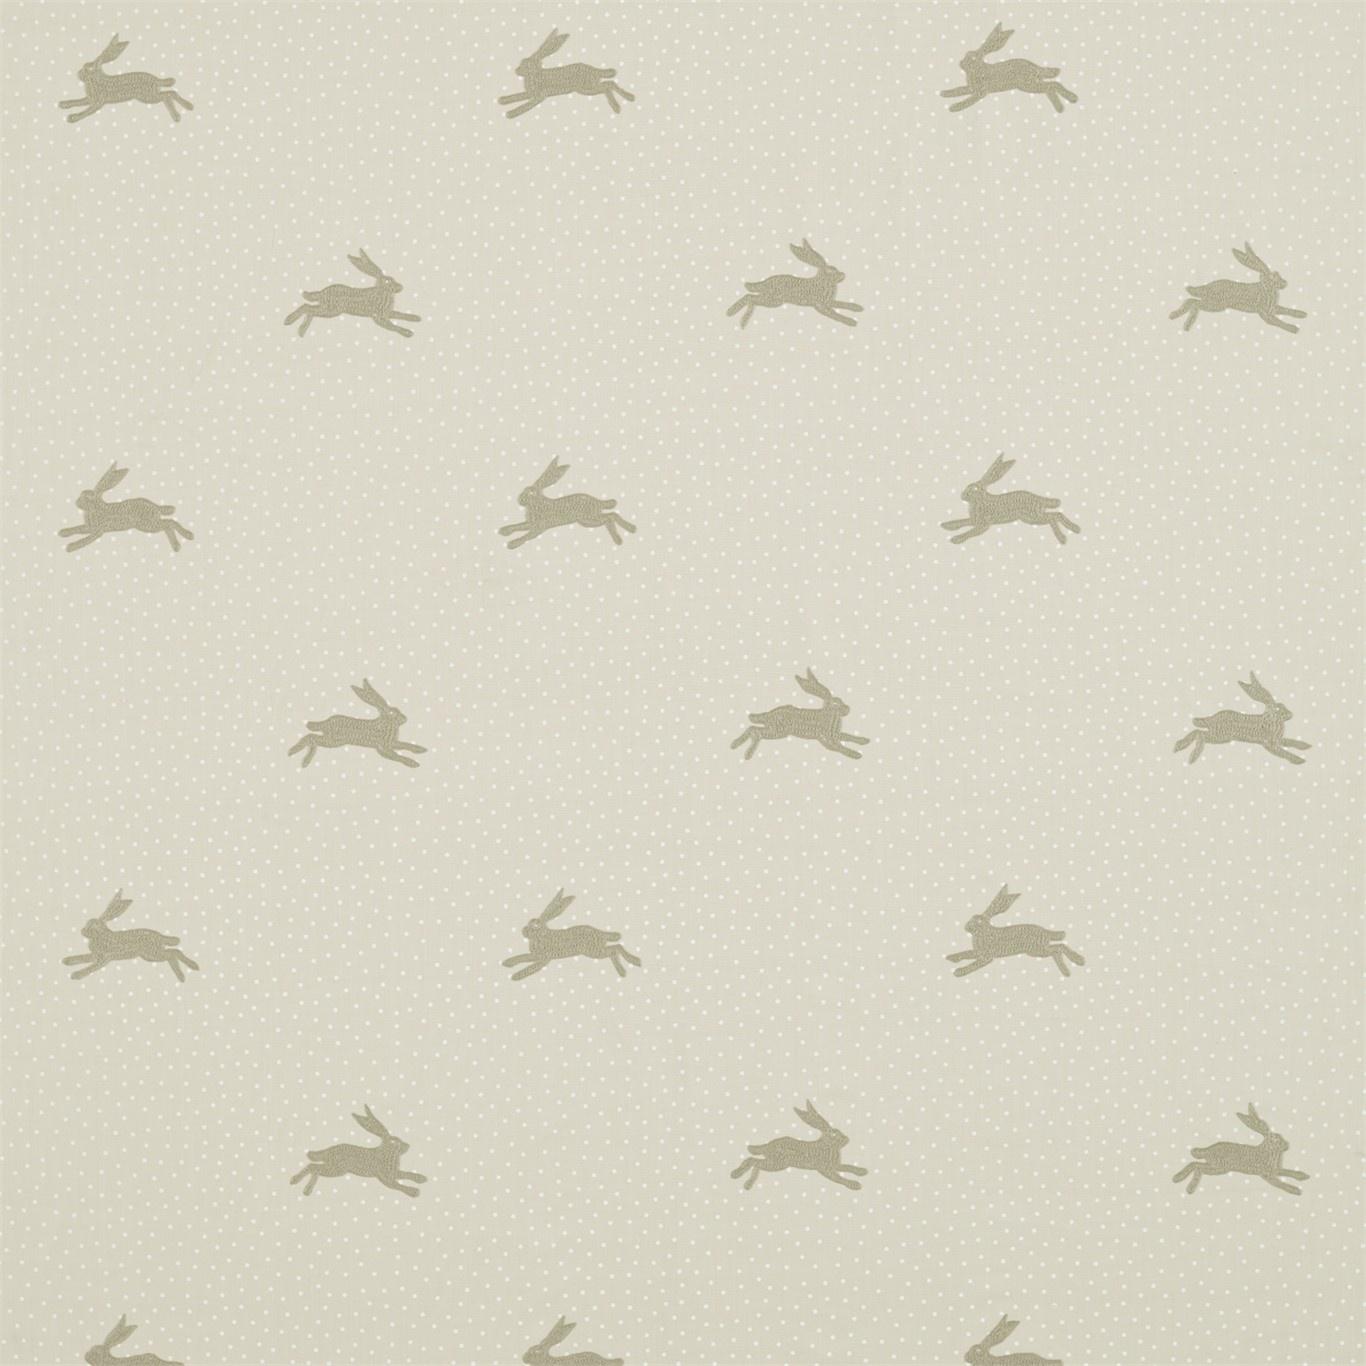 Image of Sanderson Home Warren Flint Fabric 236433